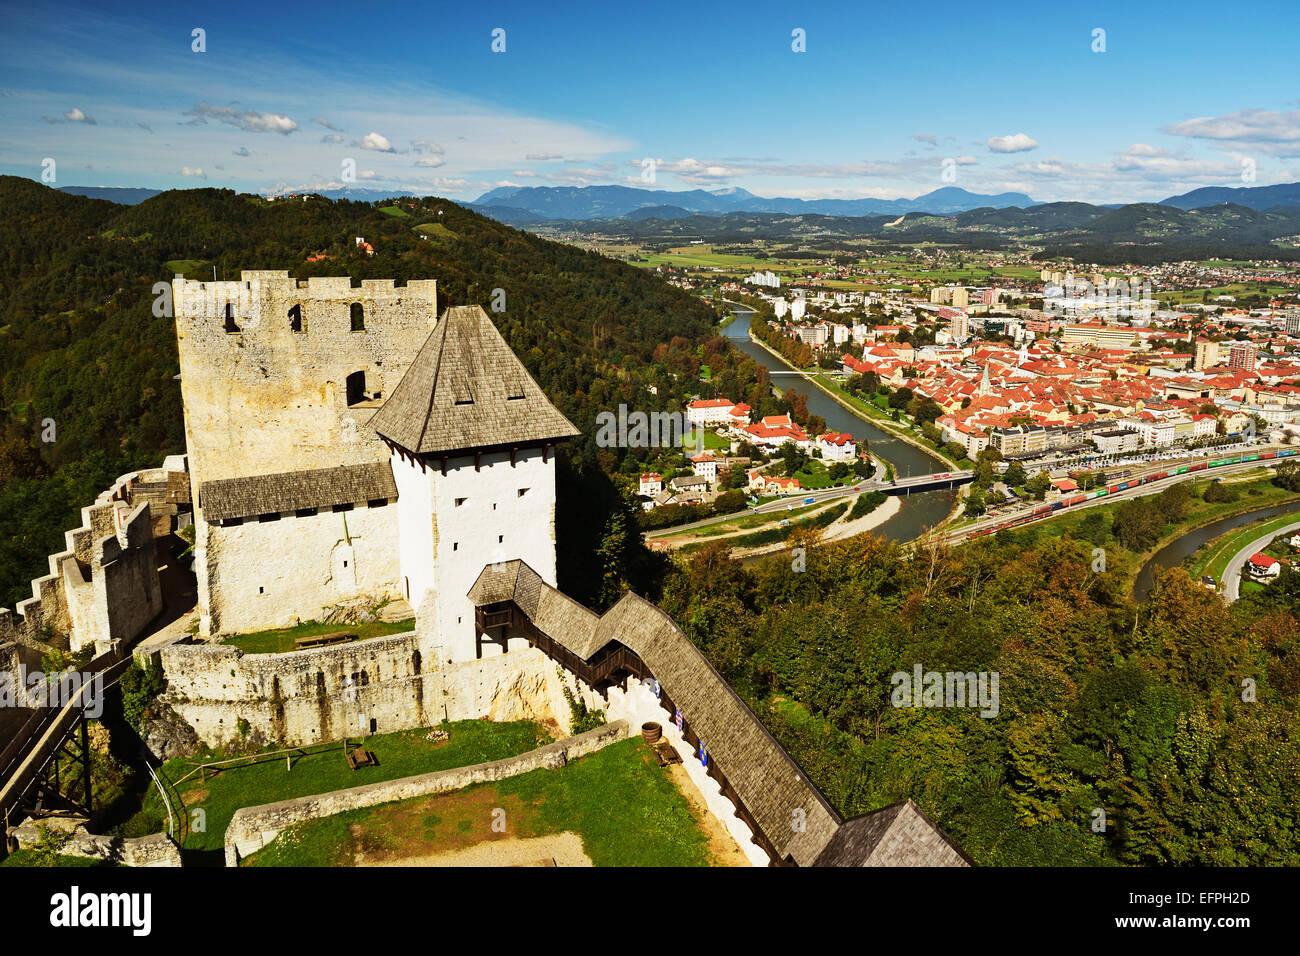 View of Celje Castle and Celje, Slovenia, Europe - Stock Image